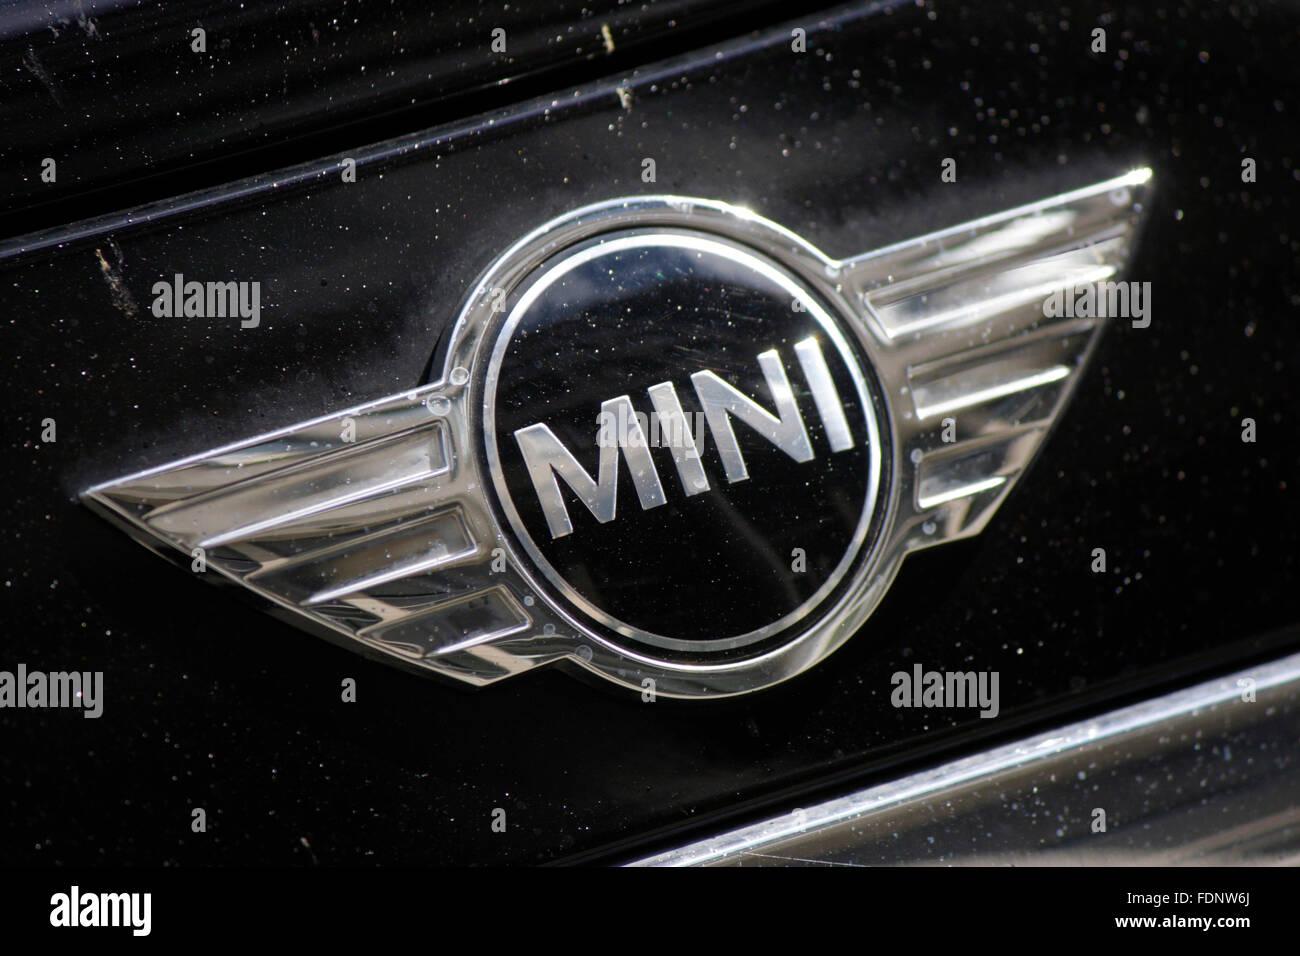 Markenname: 'Mini', de Berlín. Imagen De Stock